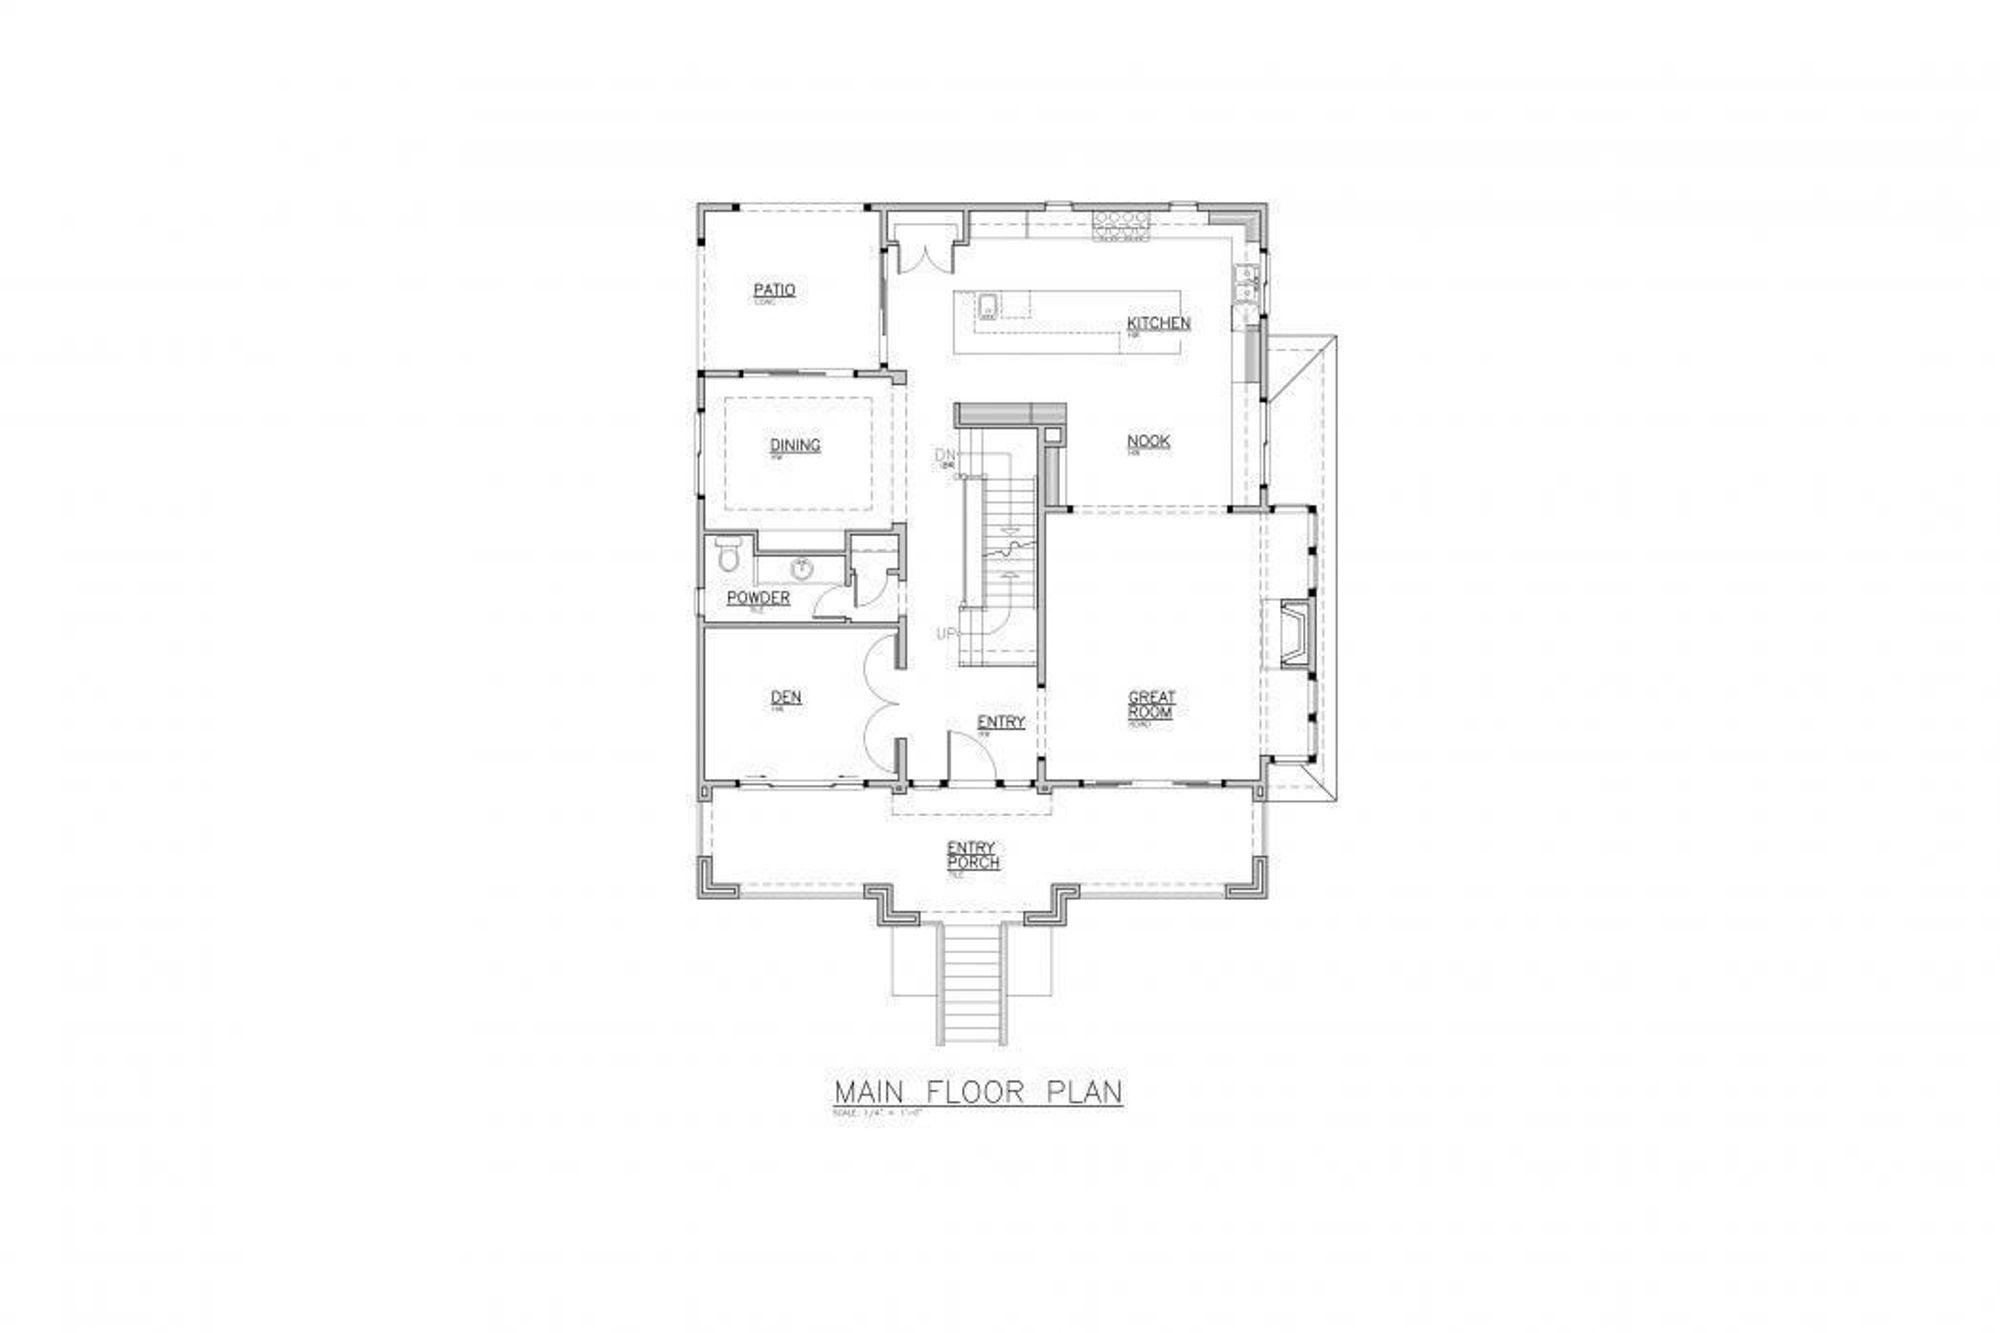 6505_1st_floor_plan.jpg